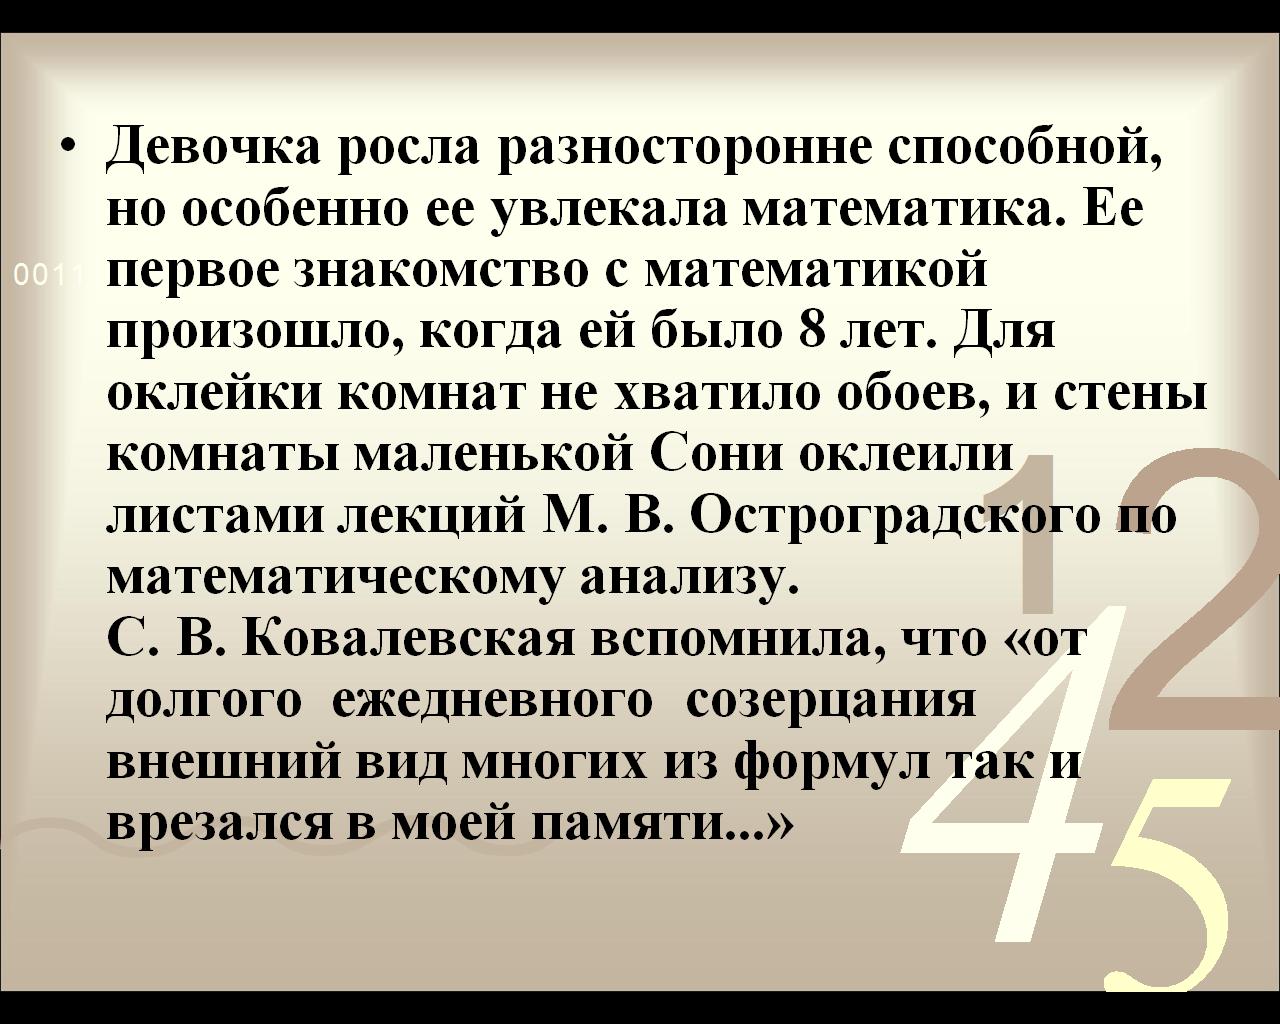 C:\Users\Grigoriy\Desktop\конкурс\слайды\4.png